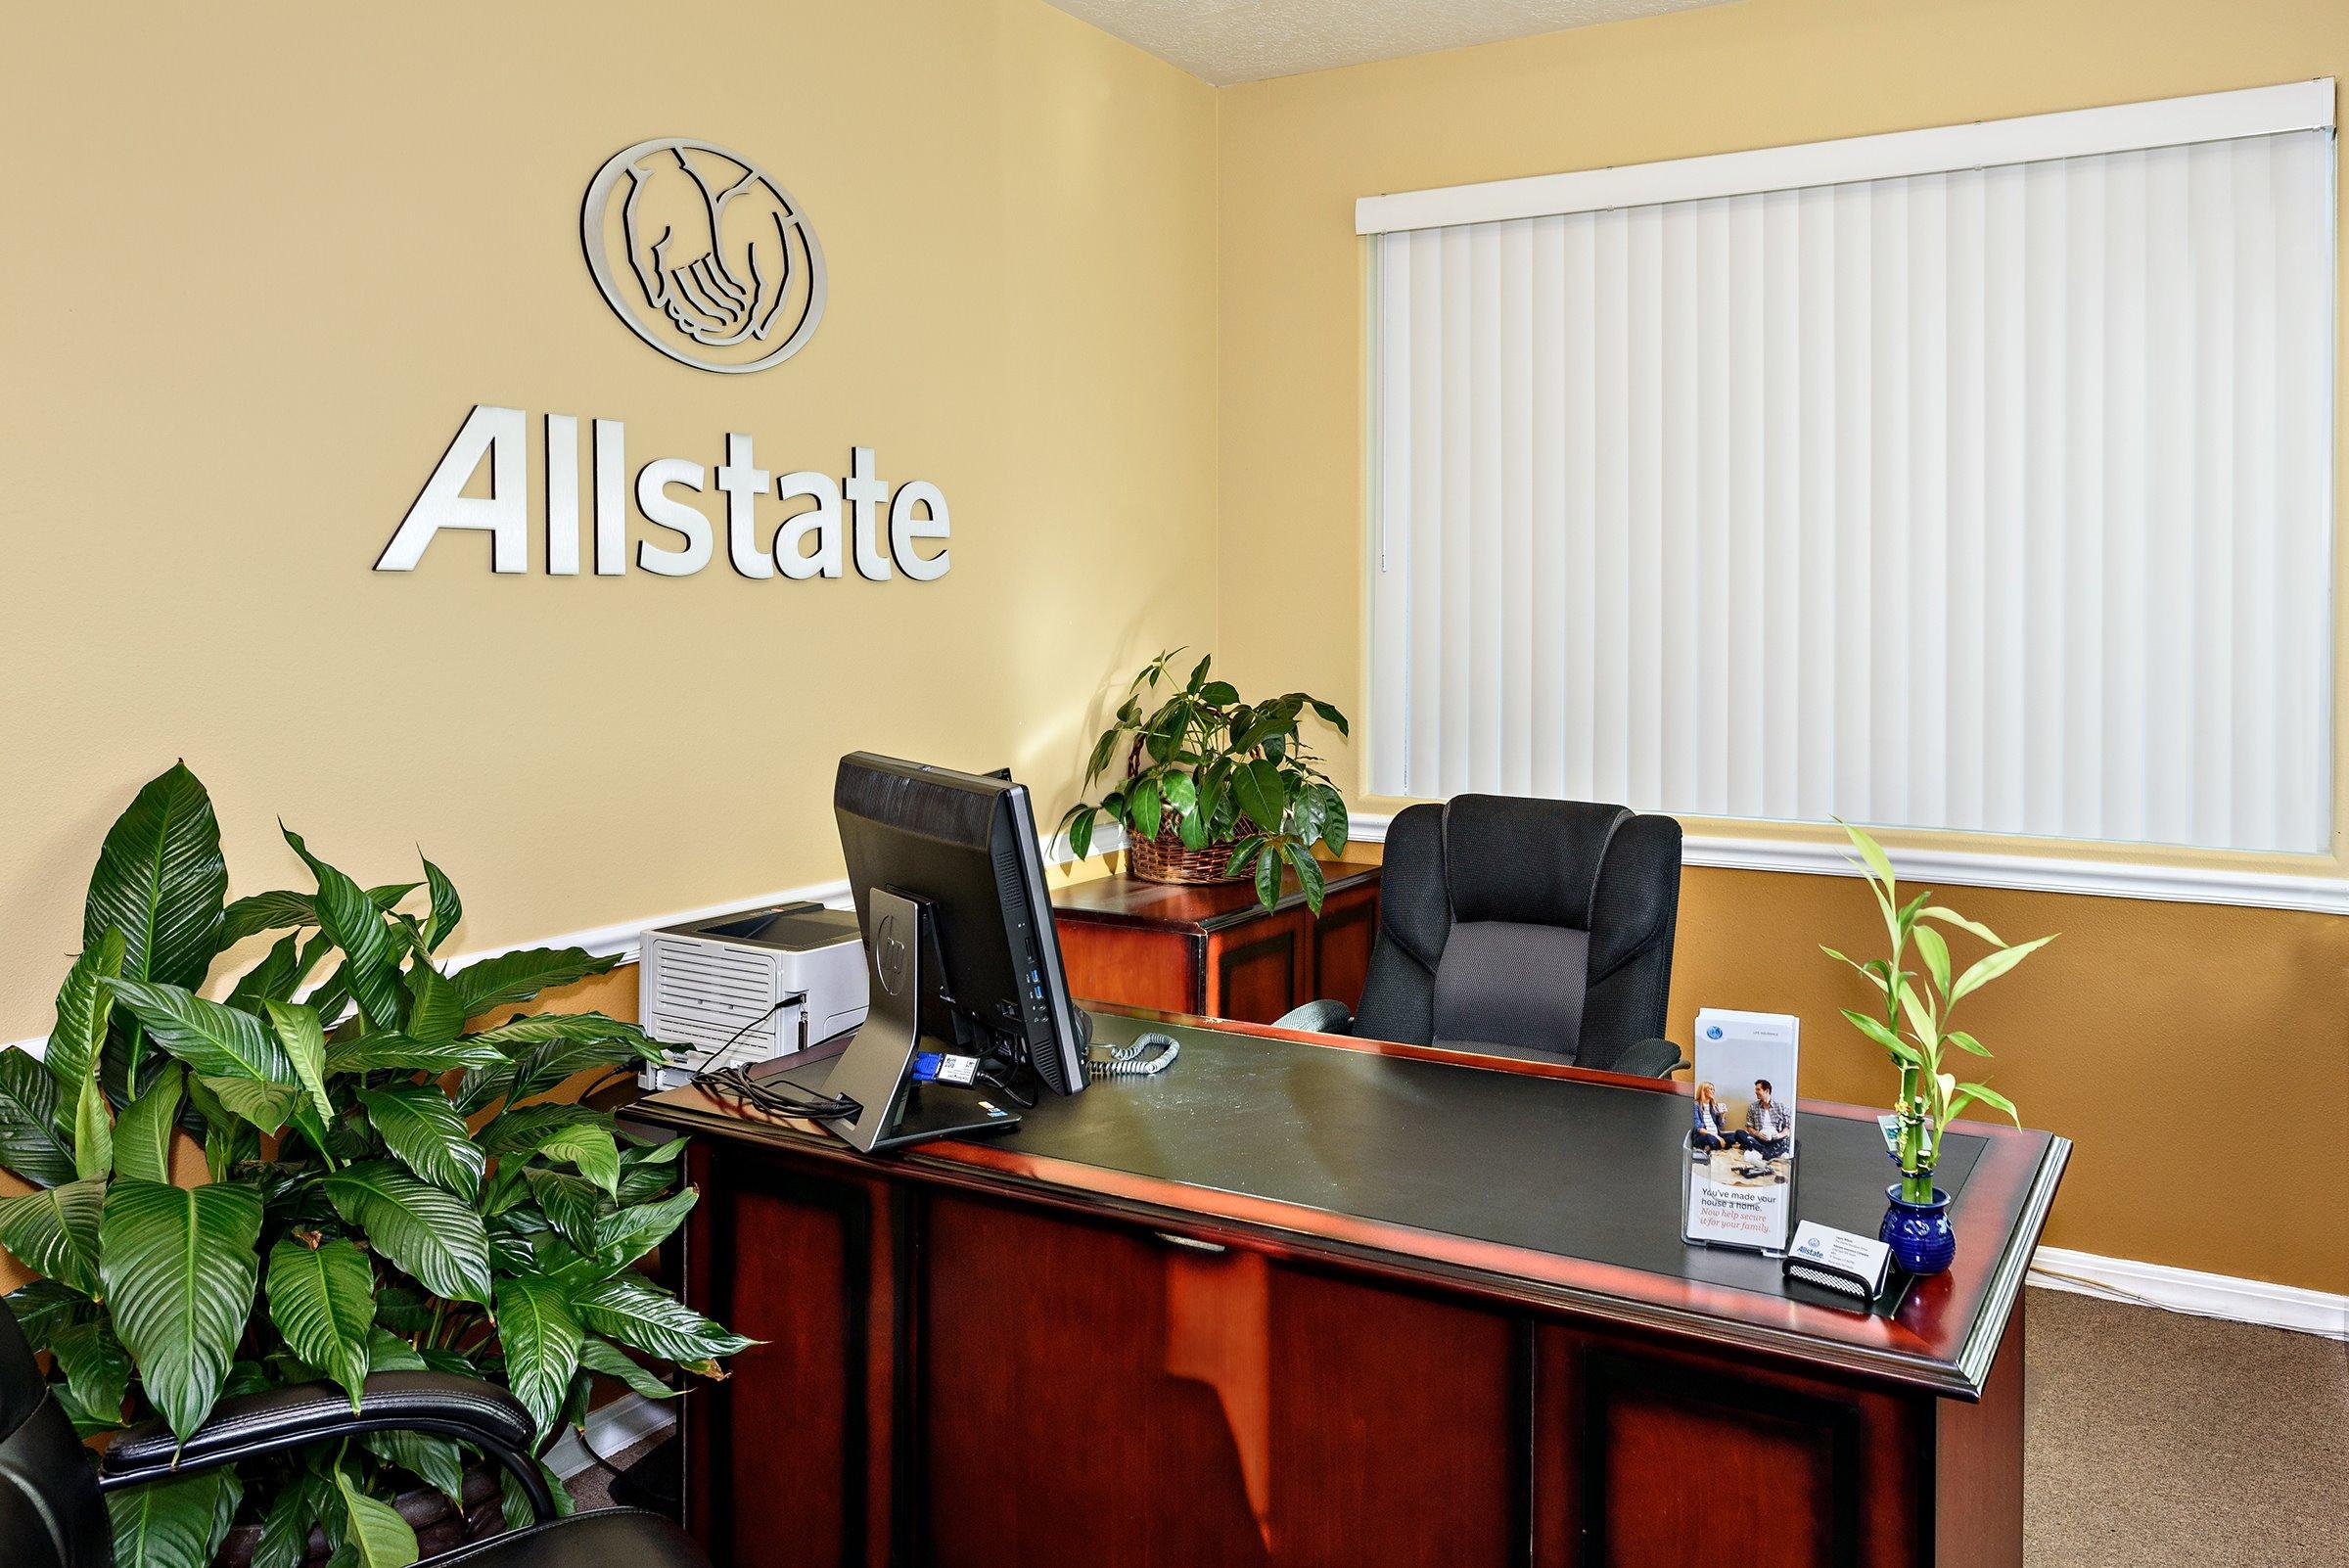 The Shonie Insurance Group, LLC: Allstate Insurance image 2